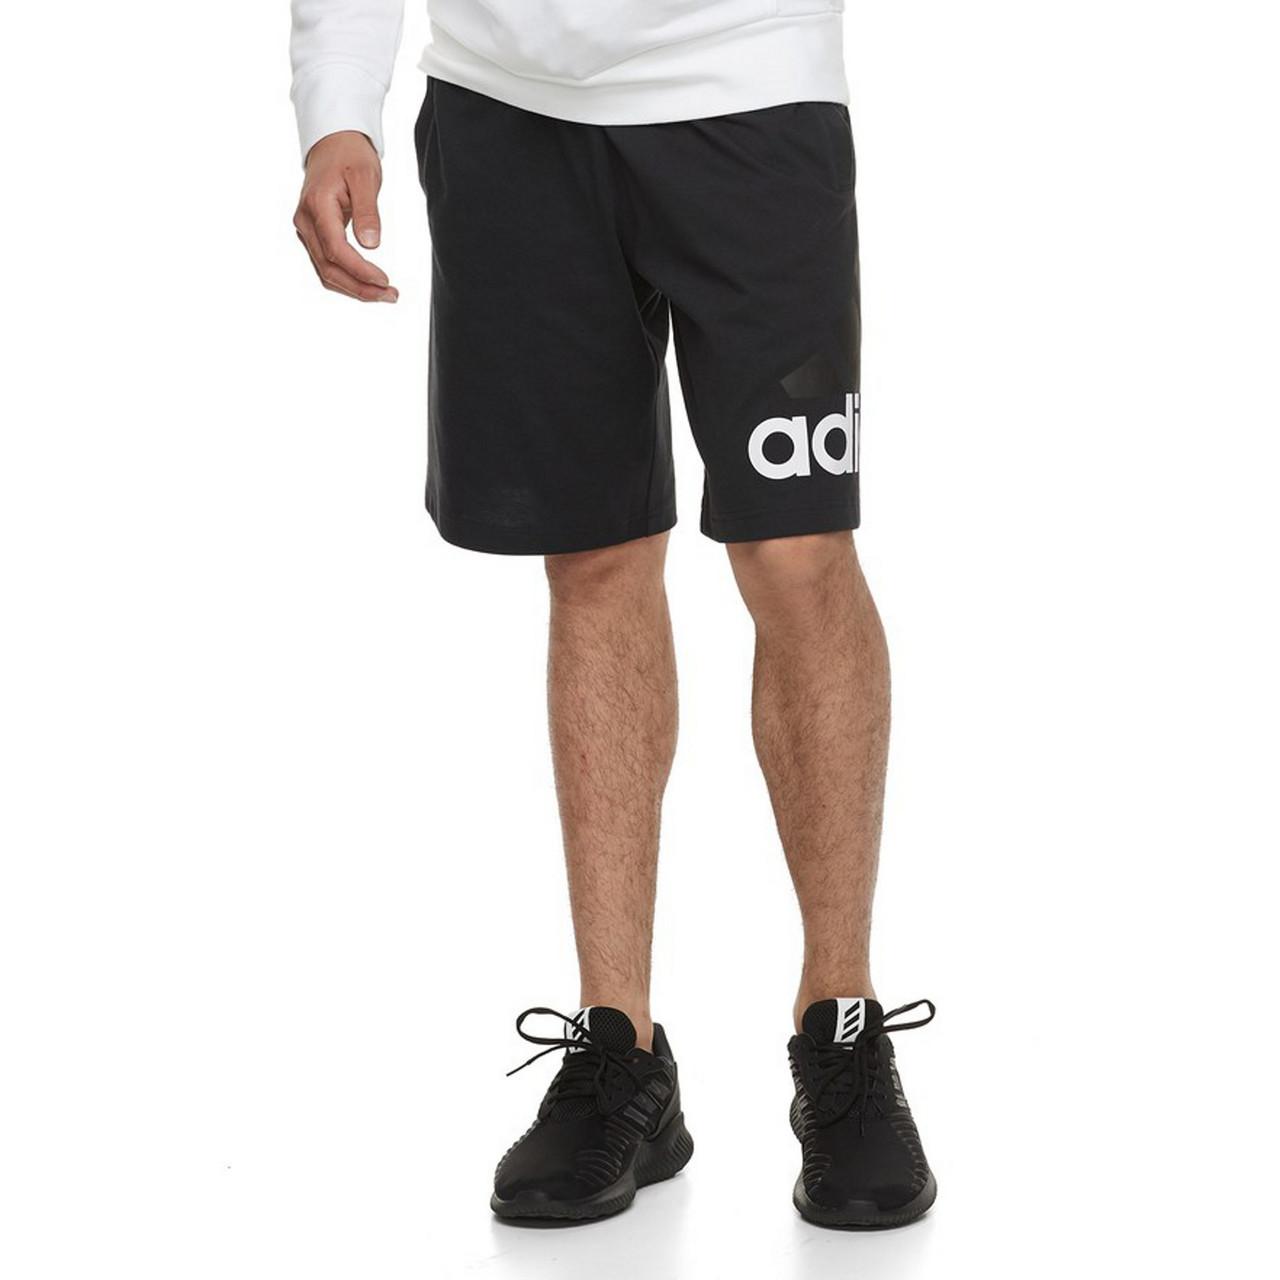 Men's Adidas Athletic Jersey Shorts